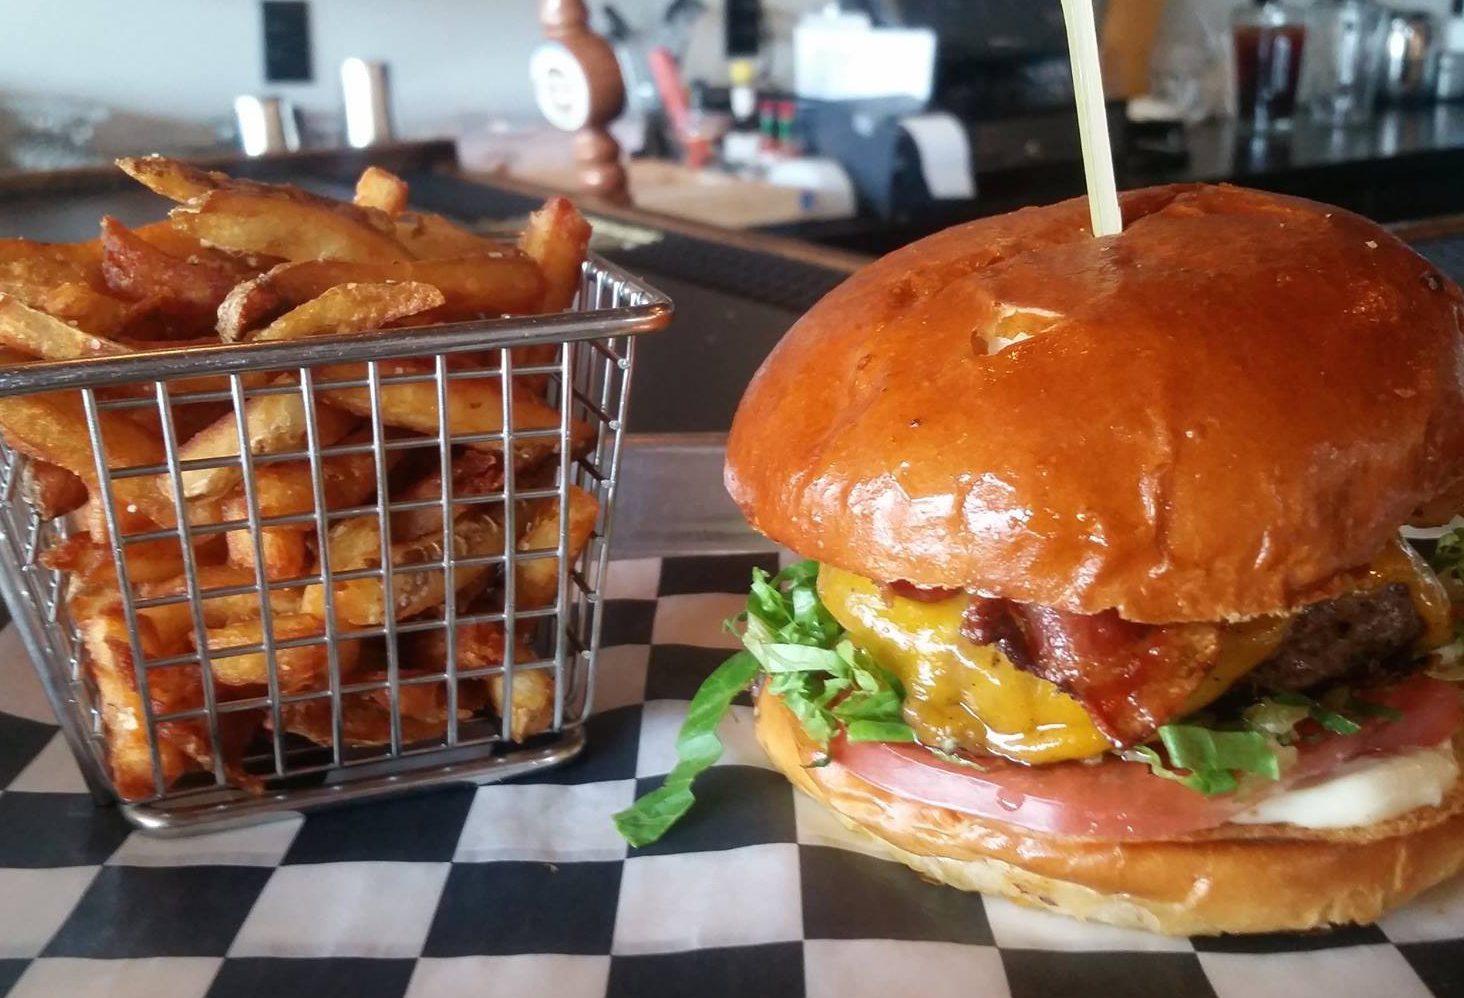 The 'Divine Swine' burger and fries at Juicy Burger Bar. (Juicy Burger Bar)